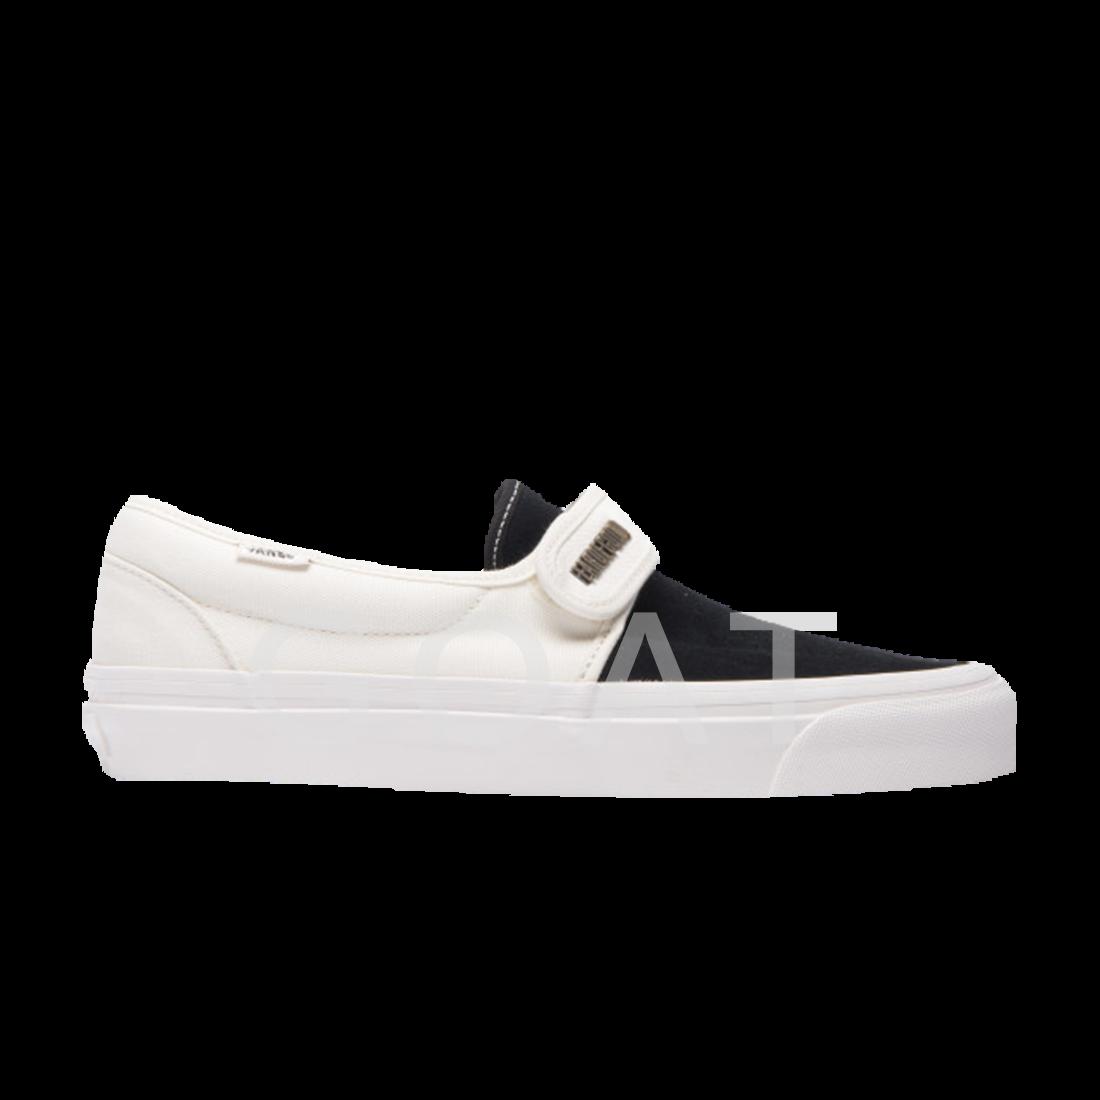 359a997707 Fear of God x Slip-On 47 DX  Collection 2 Black White  - Vans - VN0A3J9FPZR  - black white